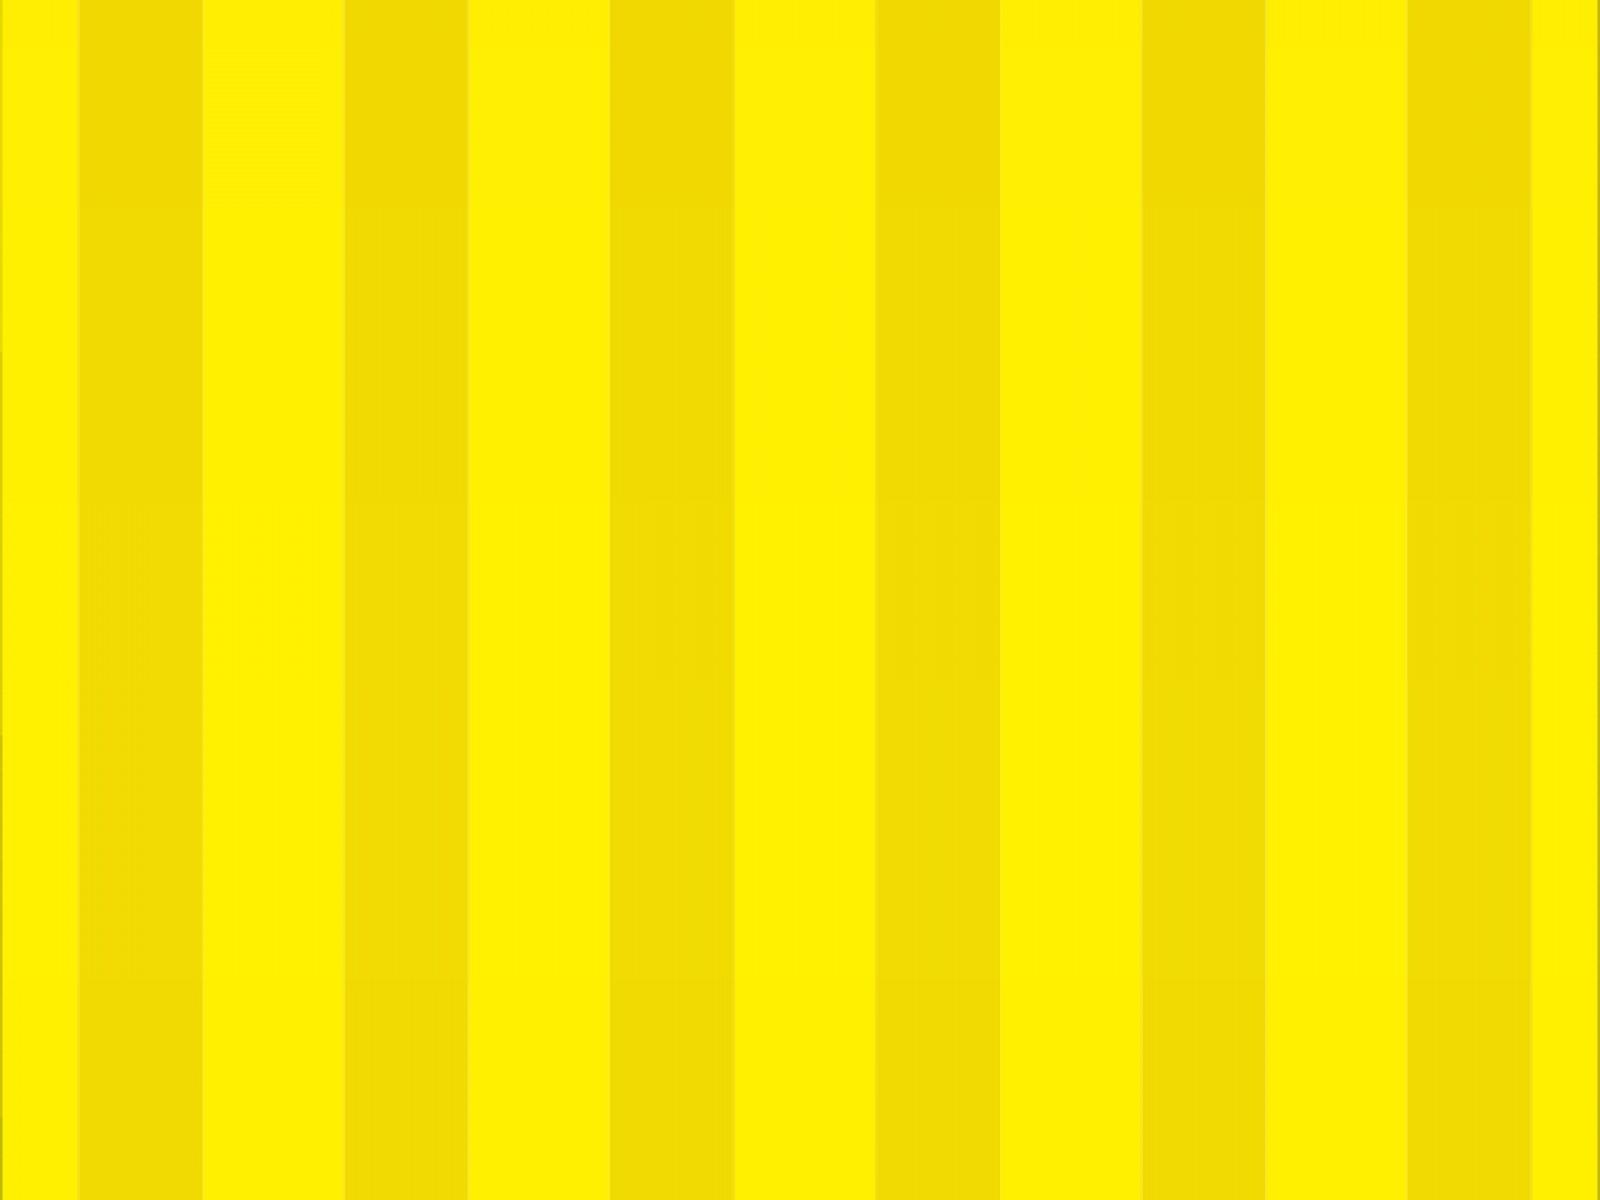 Yellow Stripe Wallpaper: Black And White Wallpapers: Yellow Vertical Stripes Wallpaper